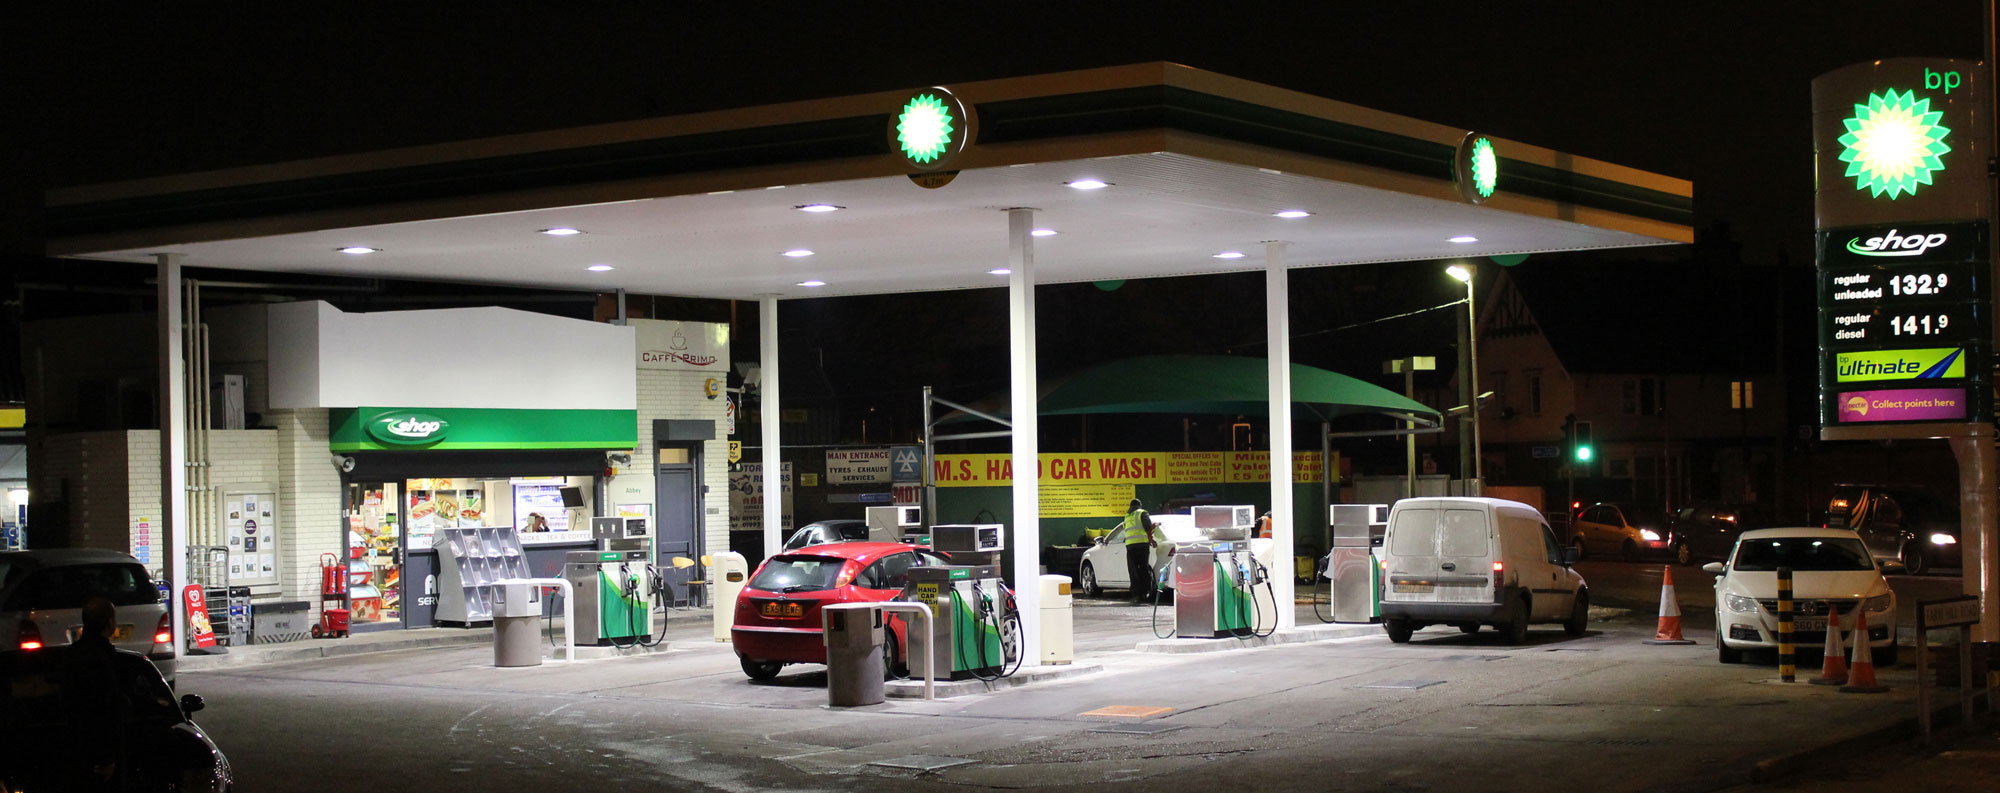 Petrol-Station-4